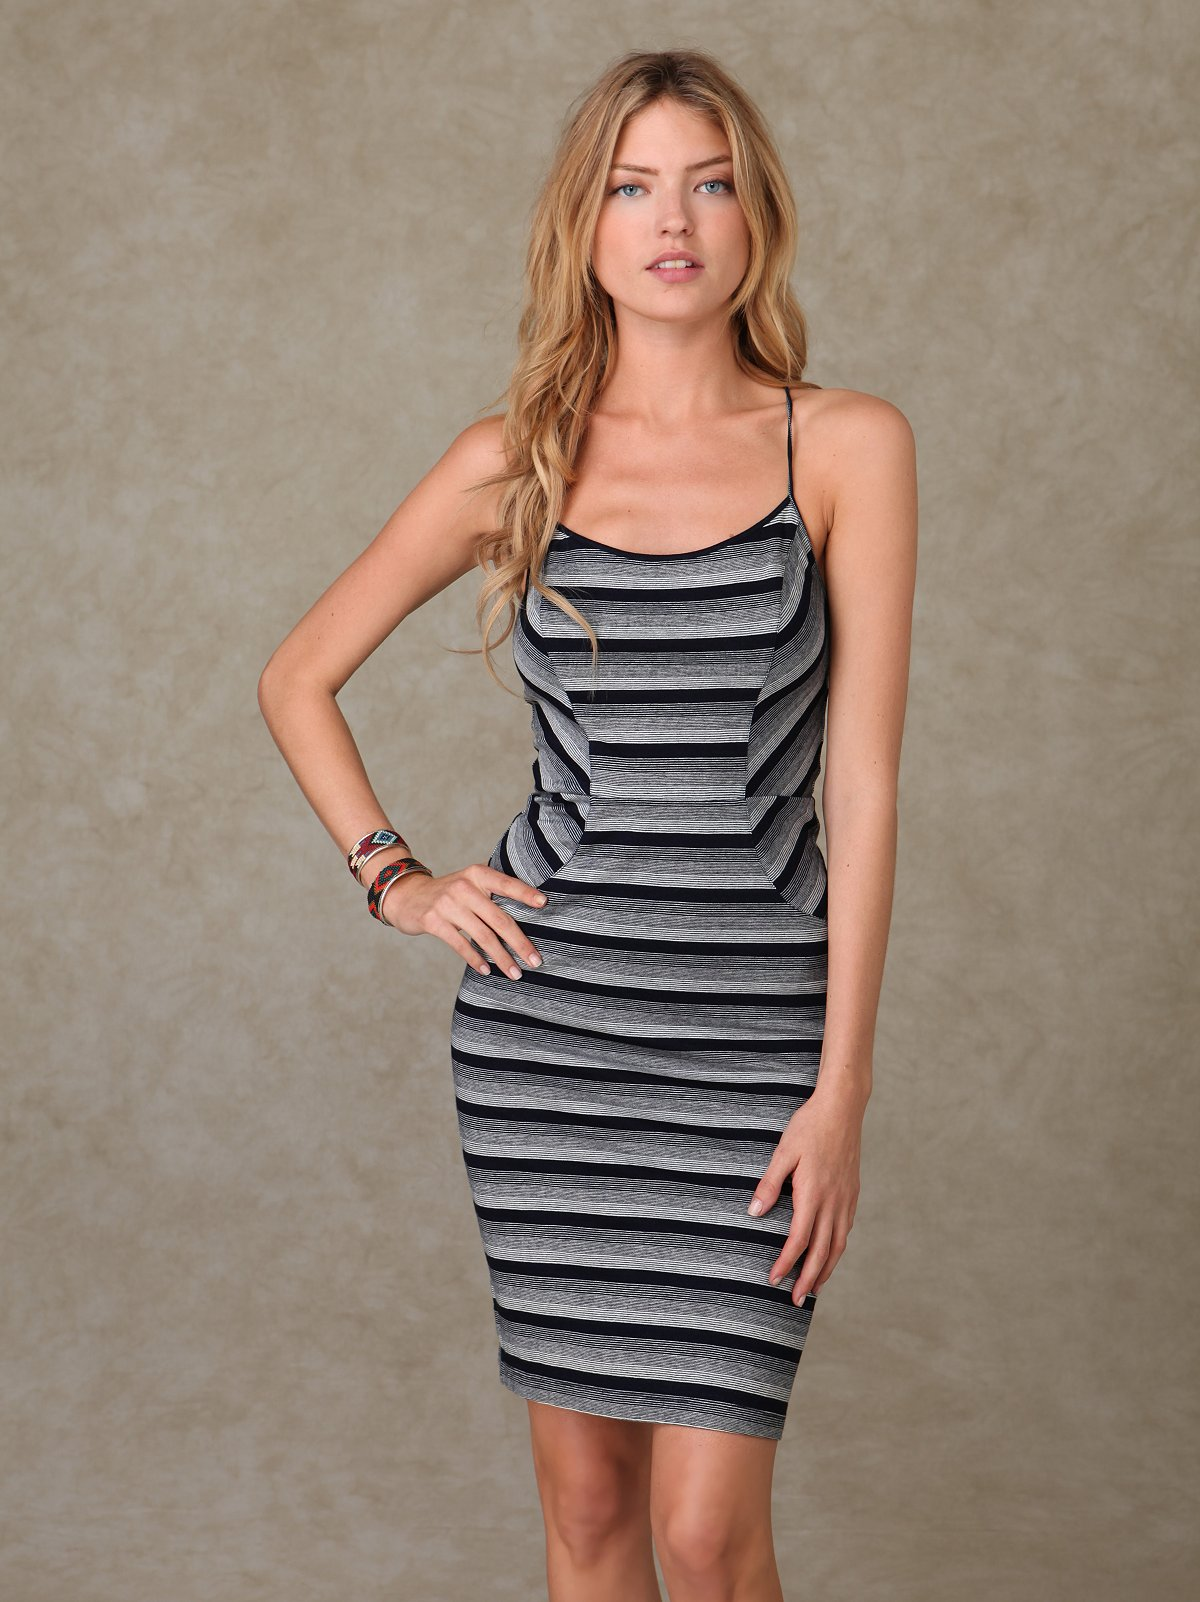 Dinner Time Tieback Dress